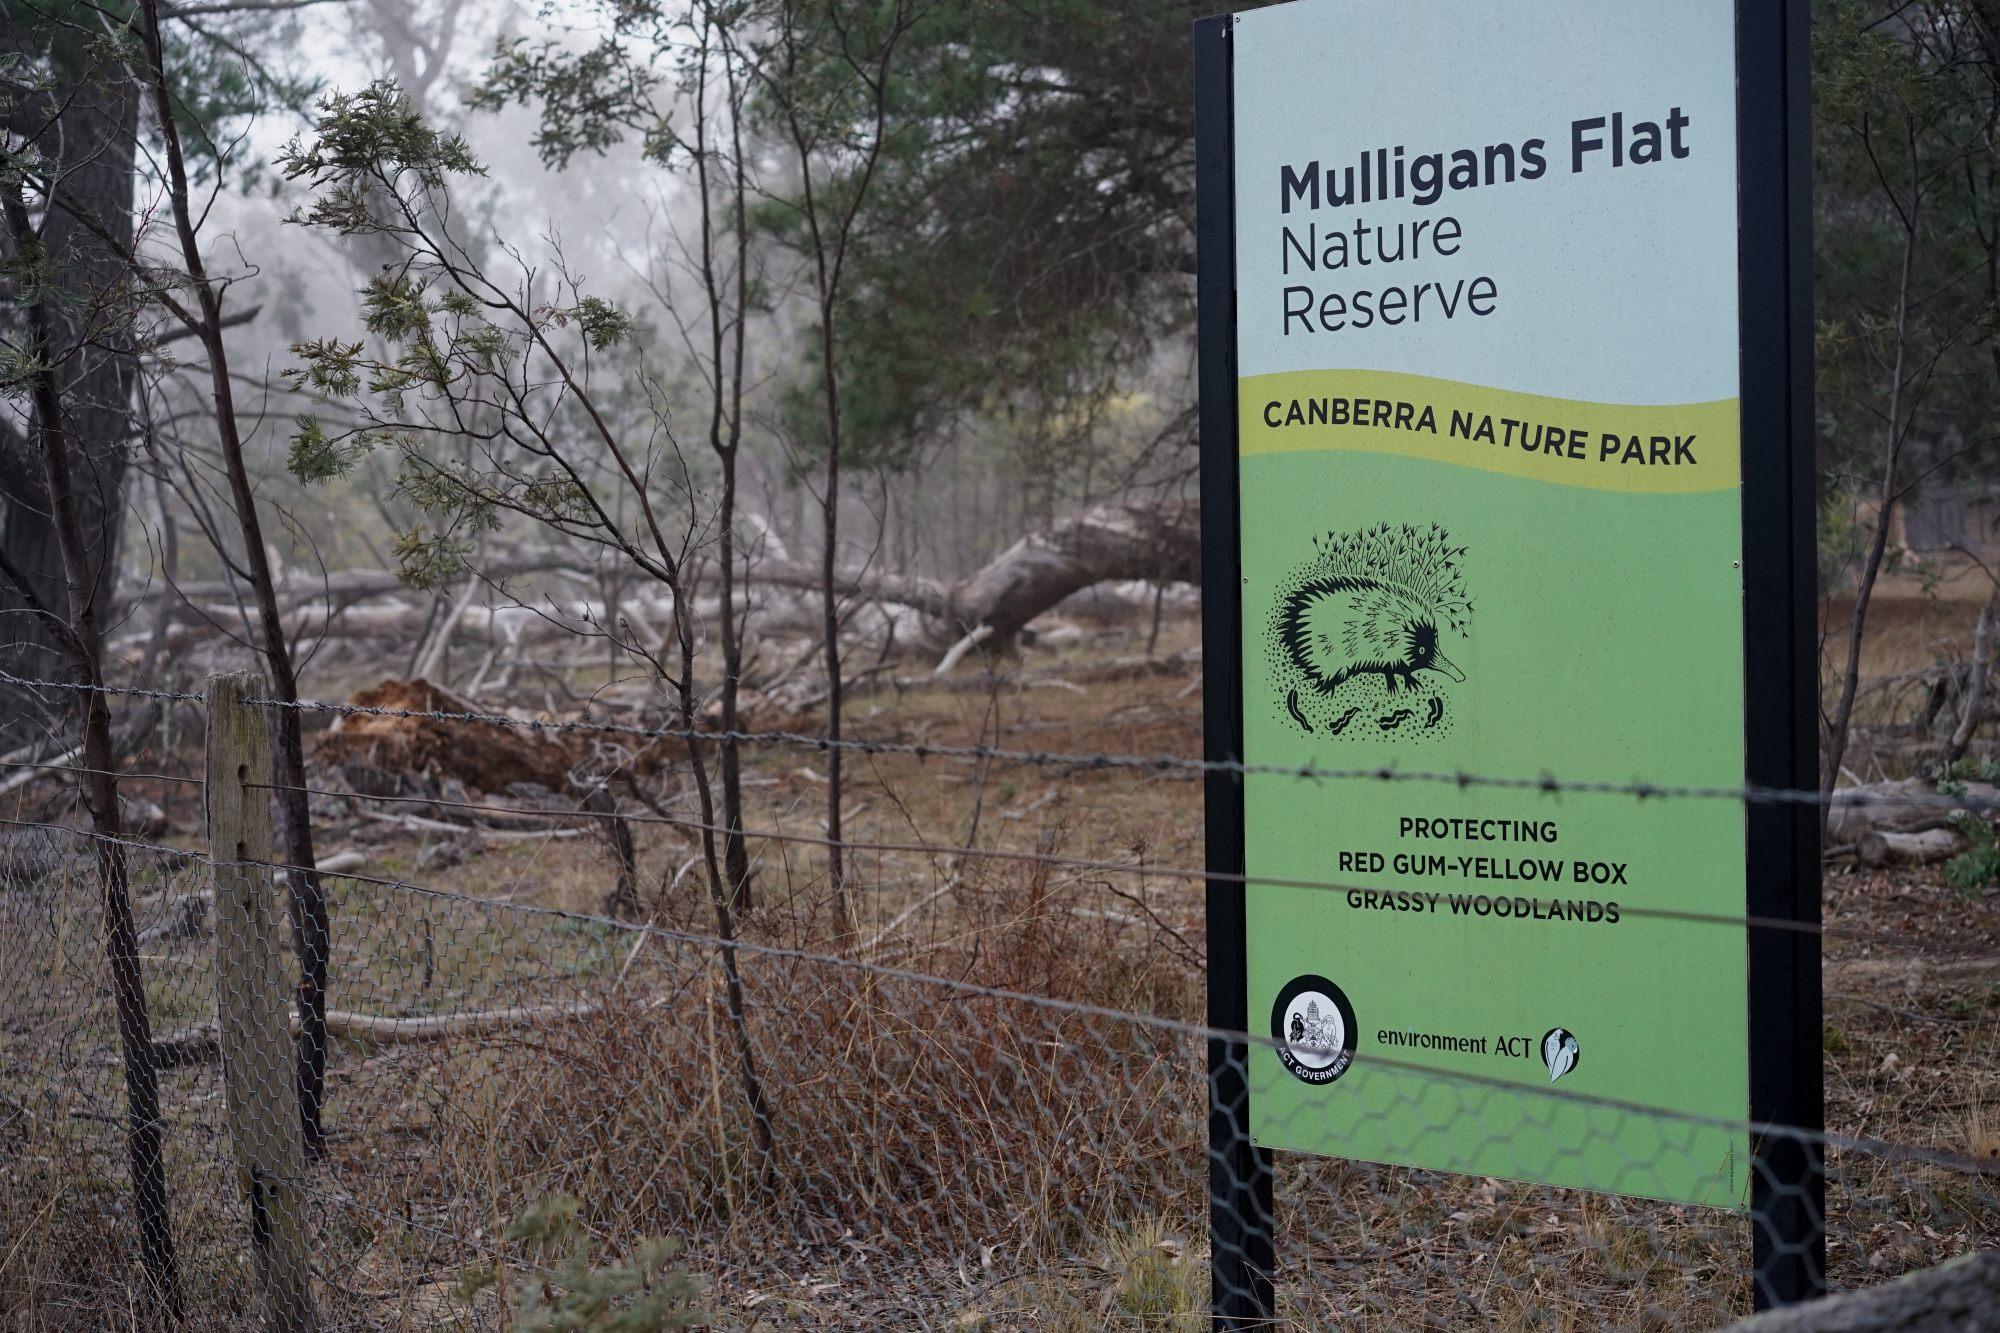 Mulligans Flat Nature Reserve